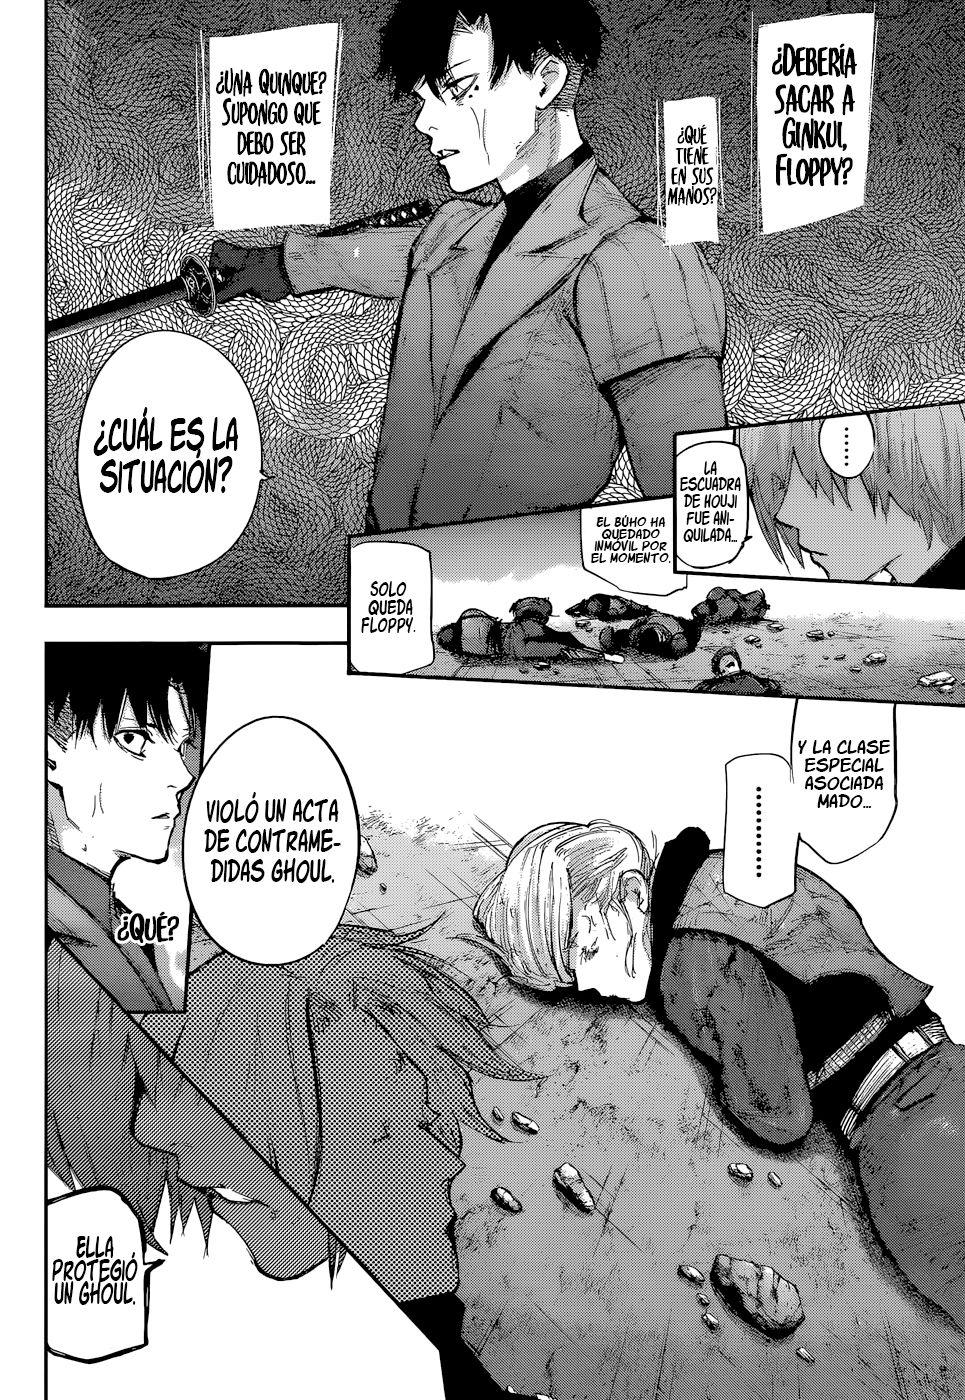 http://c5.ninemanga.com/es_manga/pic2/59/59/511239/121599da7cb94931f08b6ee38d163d7d.jpg Page 3